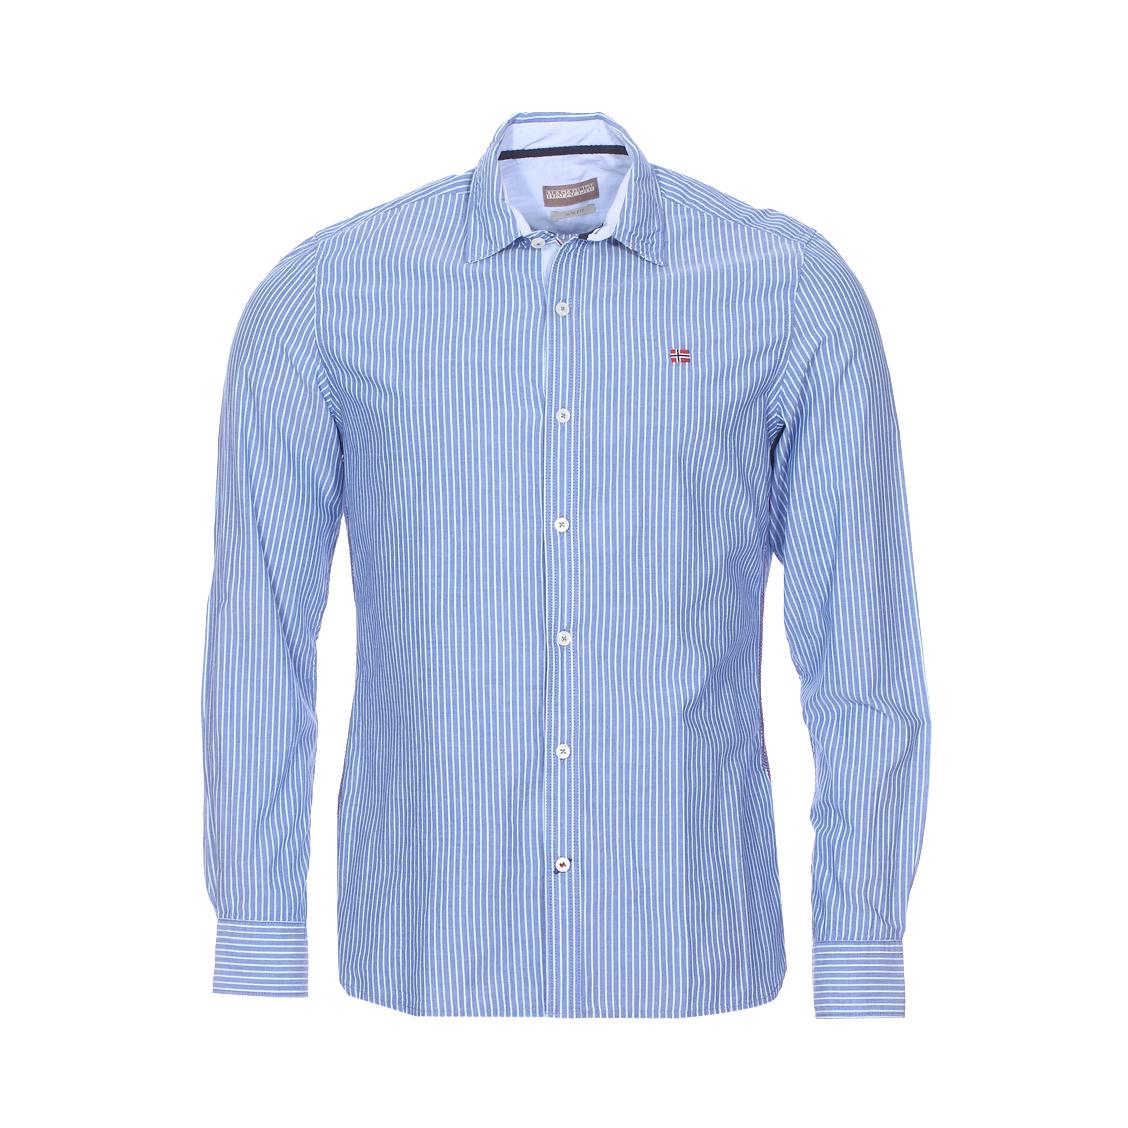 Chemise cintrée gulfport  en coton bleu indigo à rayures bleu ciel et blanches